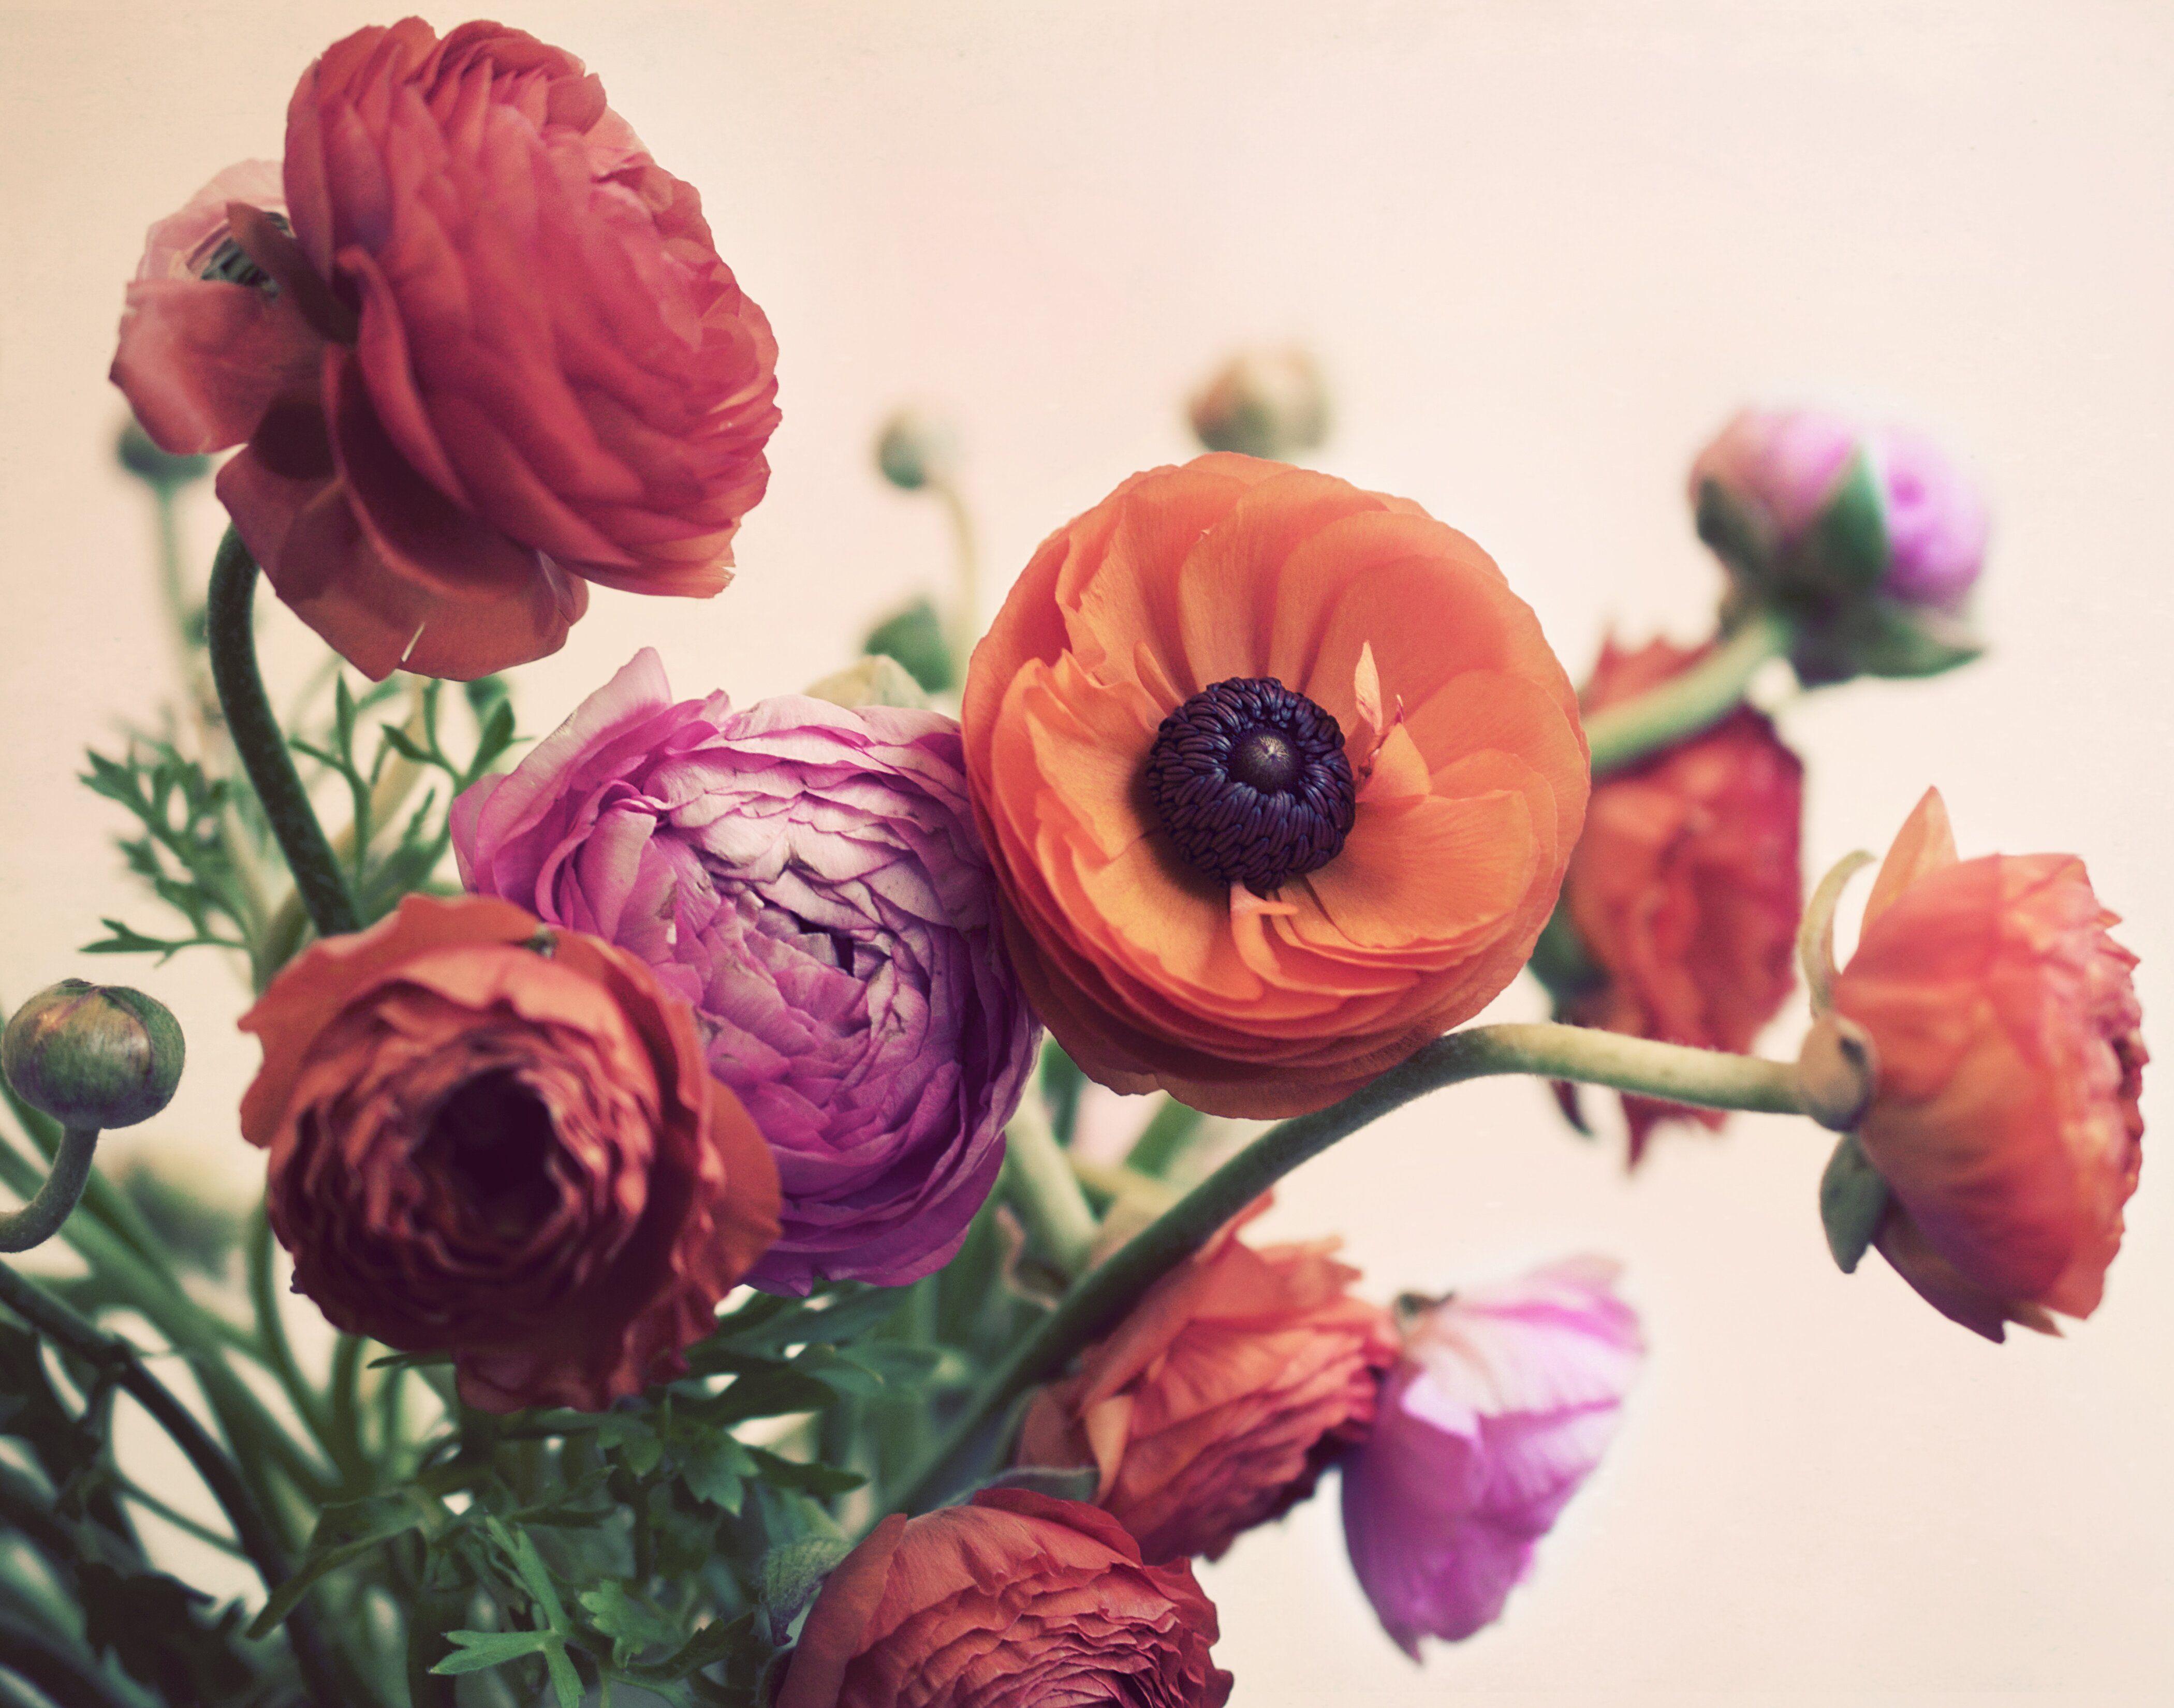 Ranunculus Flower Images